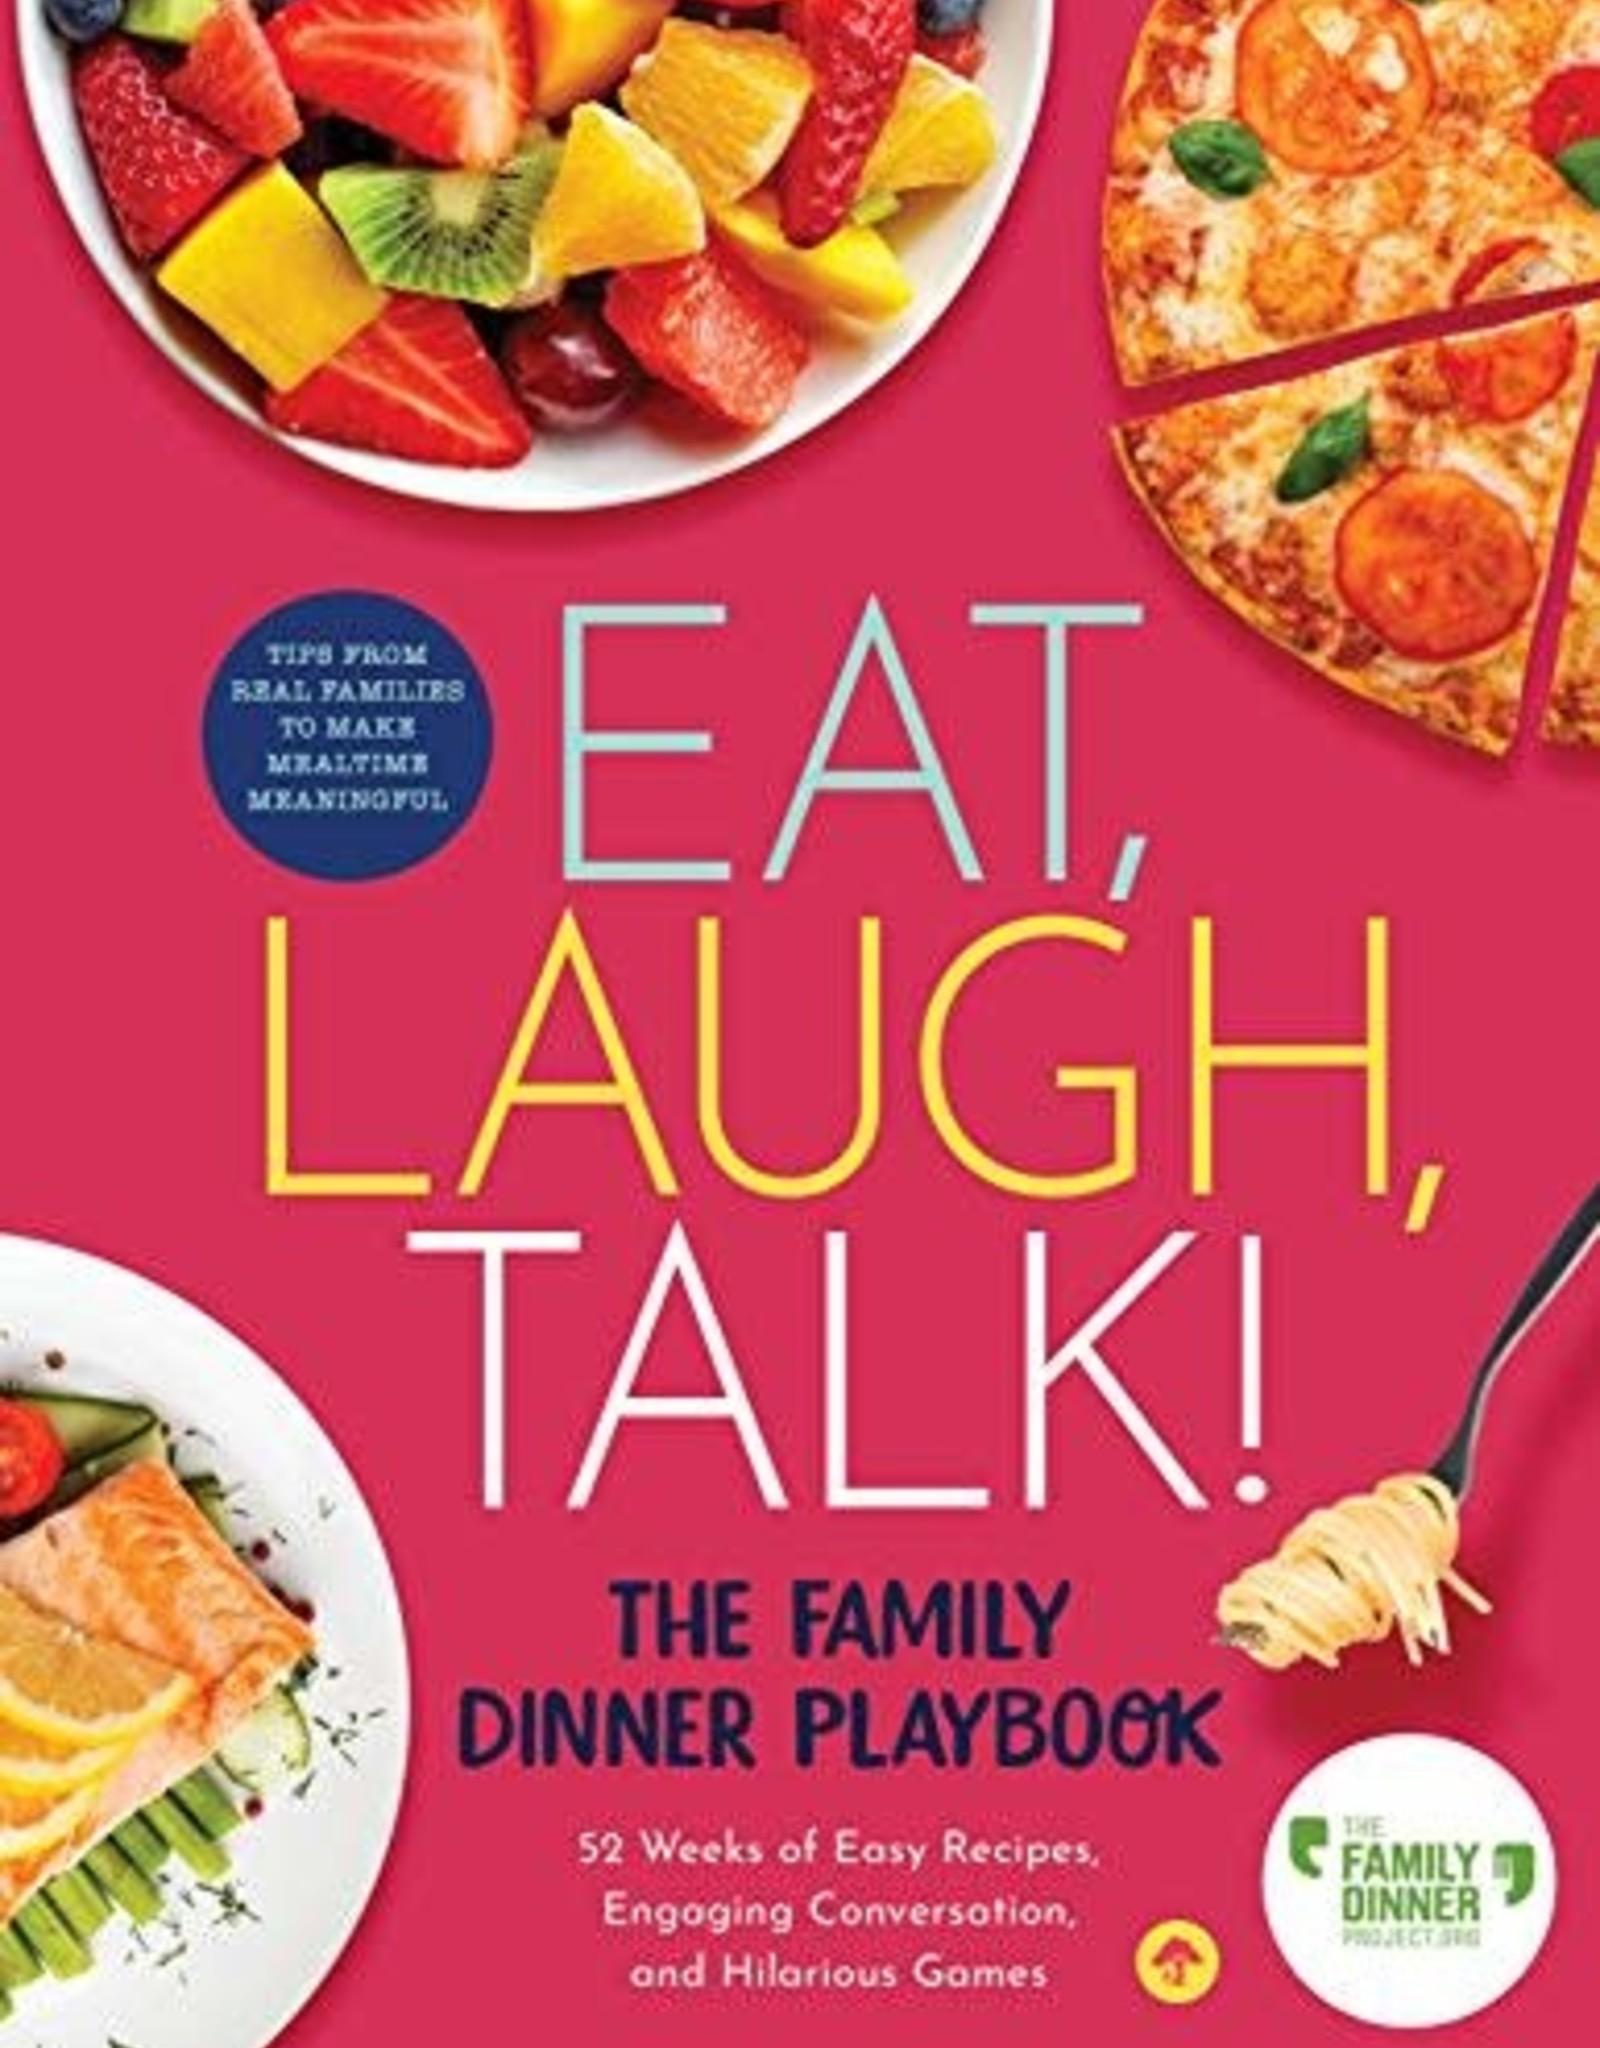 Wink Eat Laugh Talk Cookbook